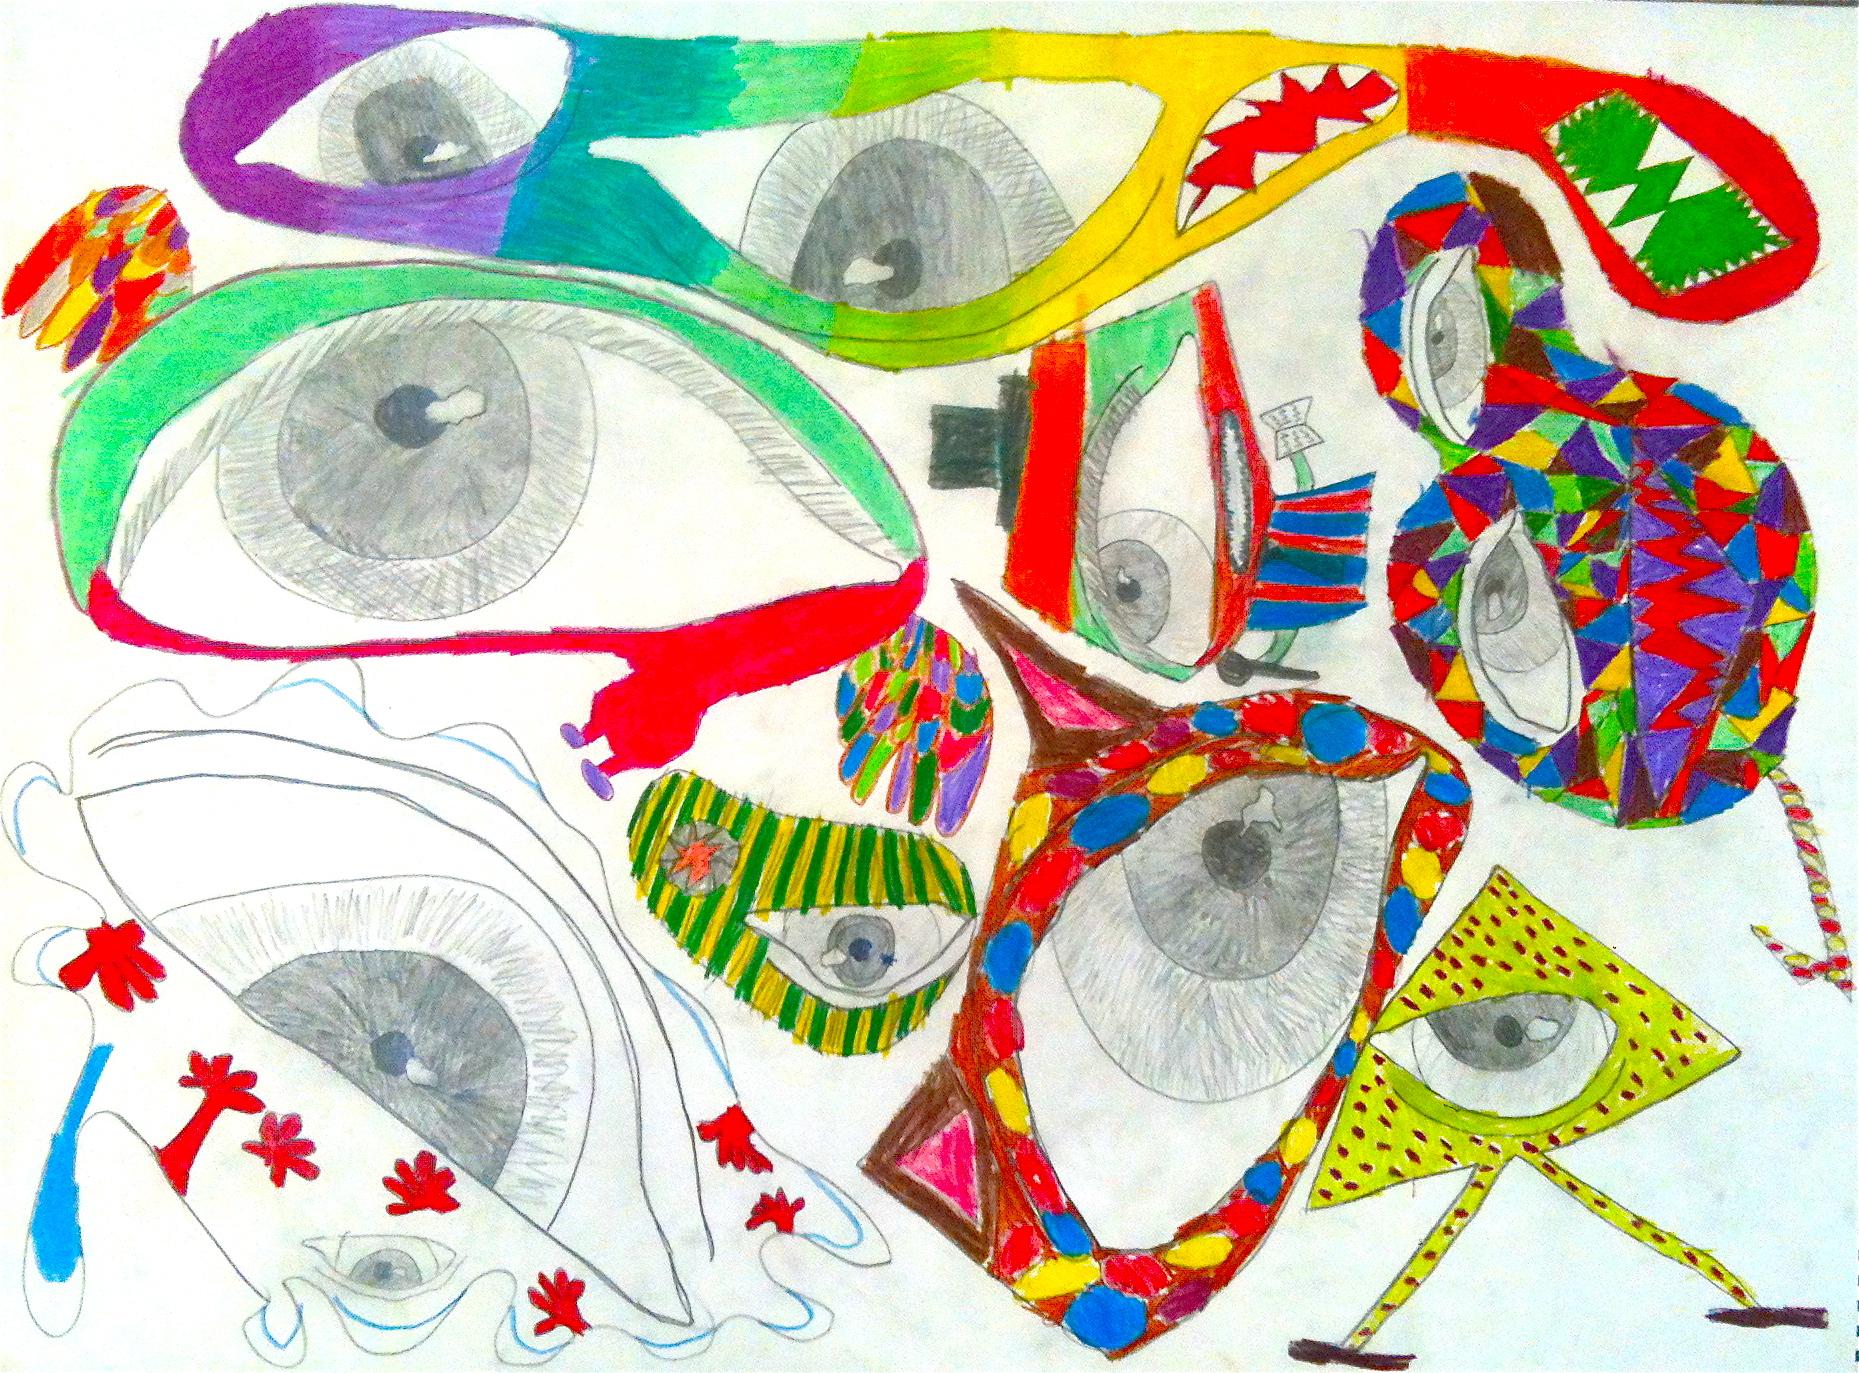 Figurative Imagination - Mixed Media